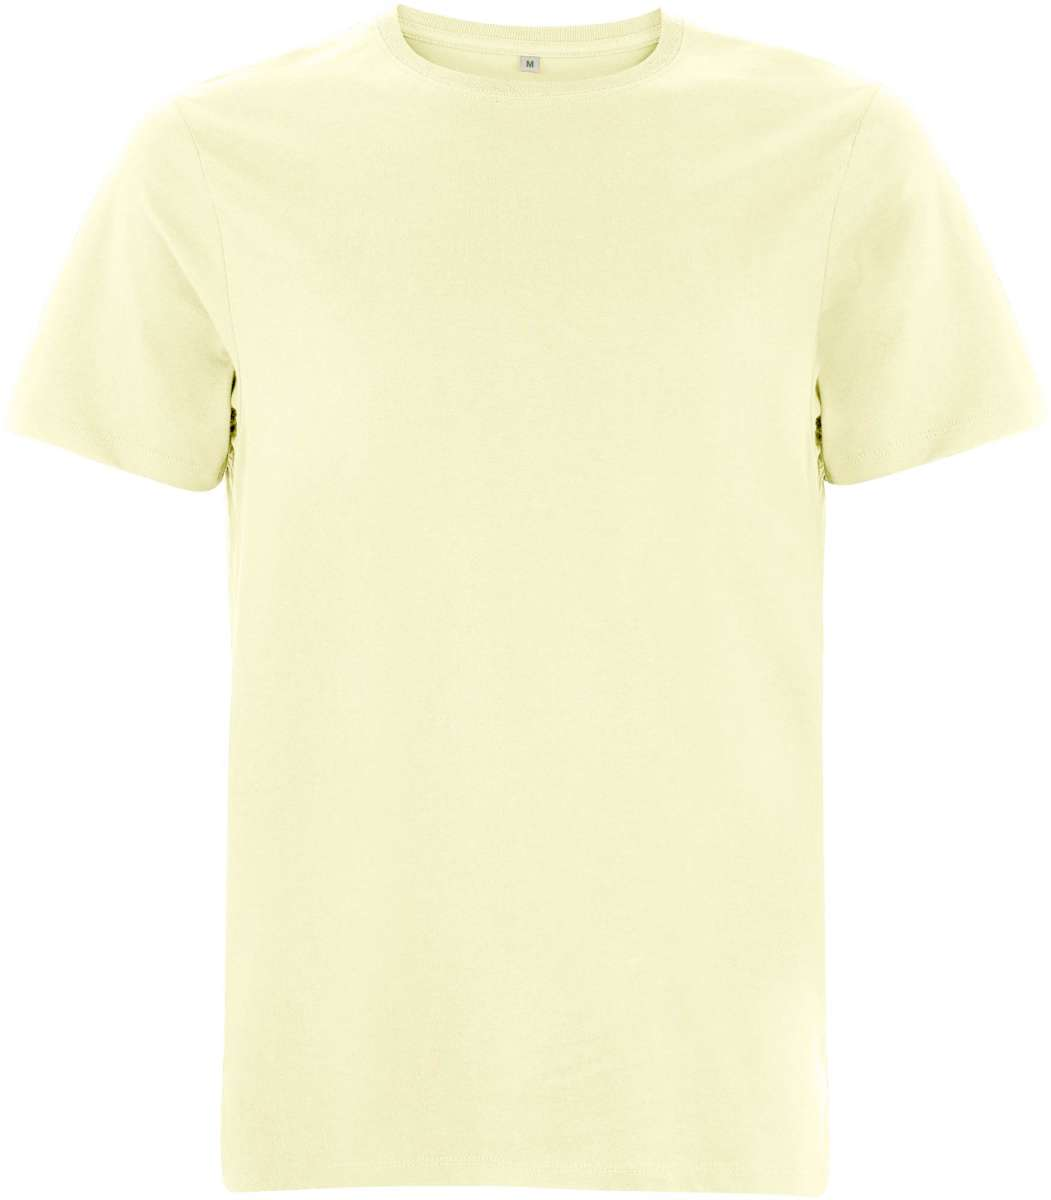 Yo | Men's Basic Cut T-shirt